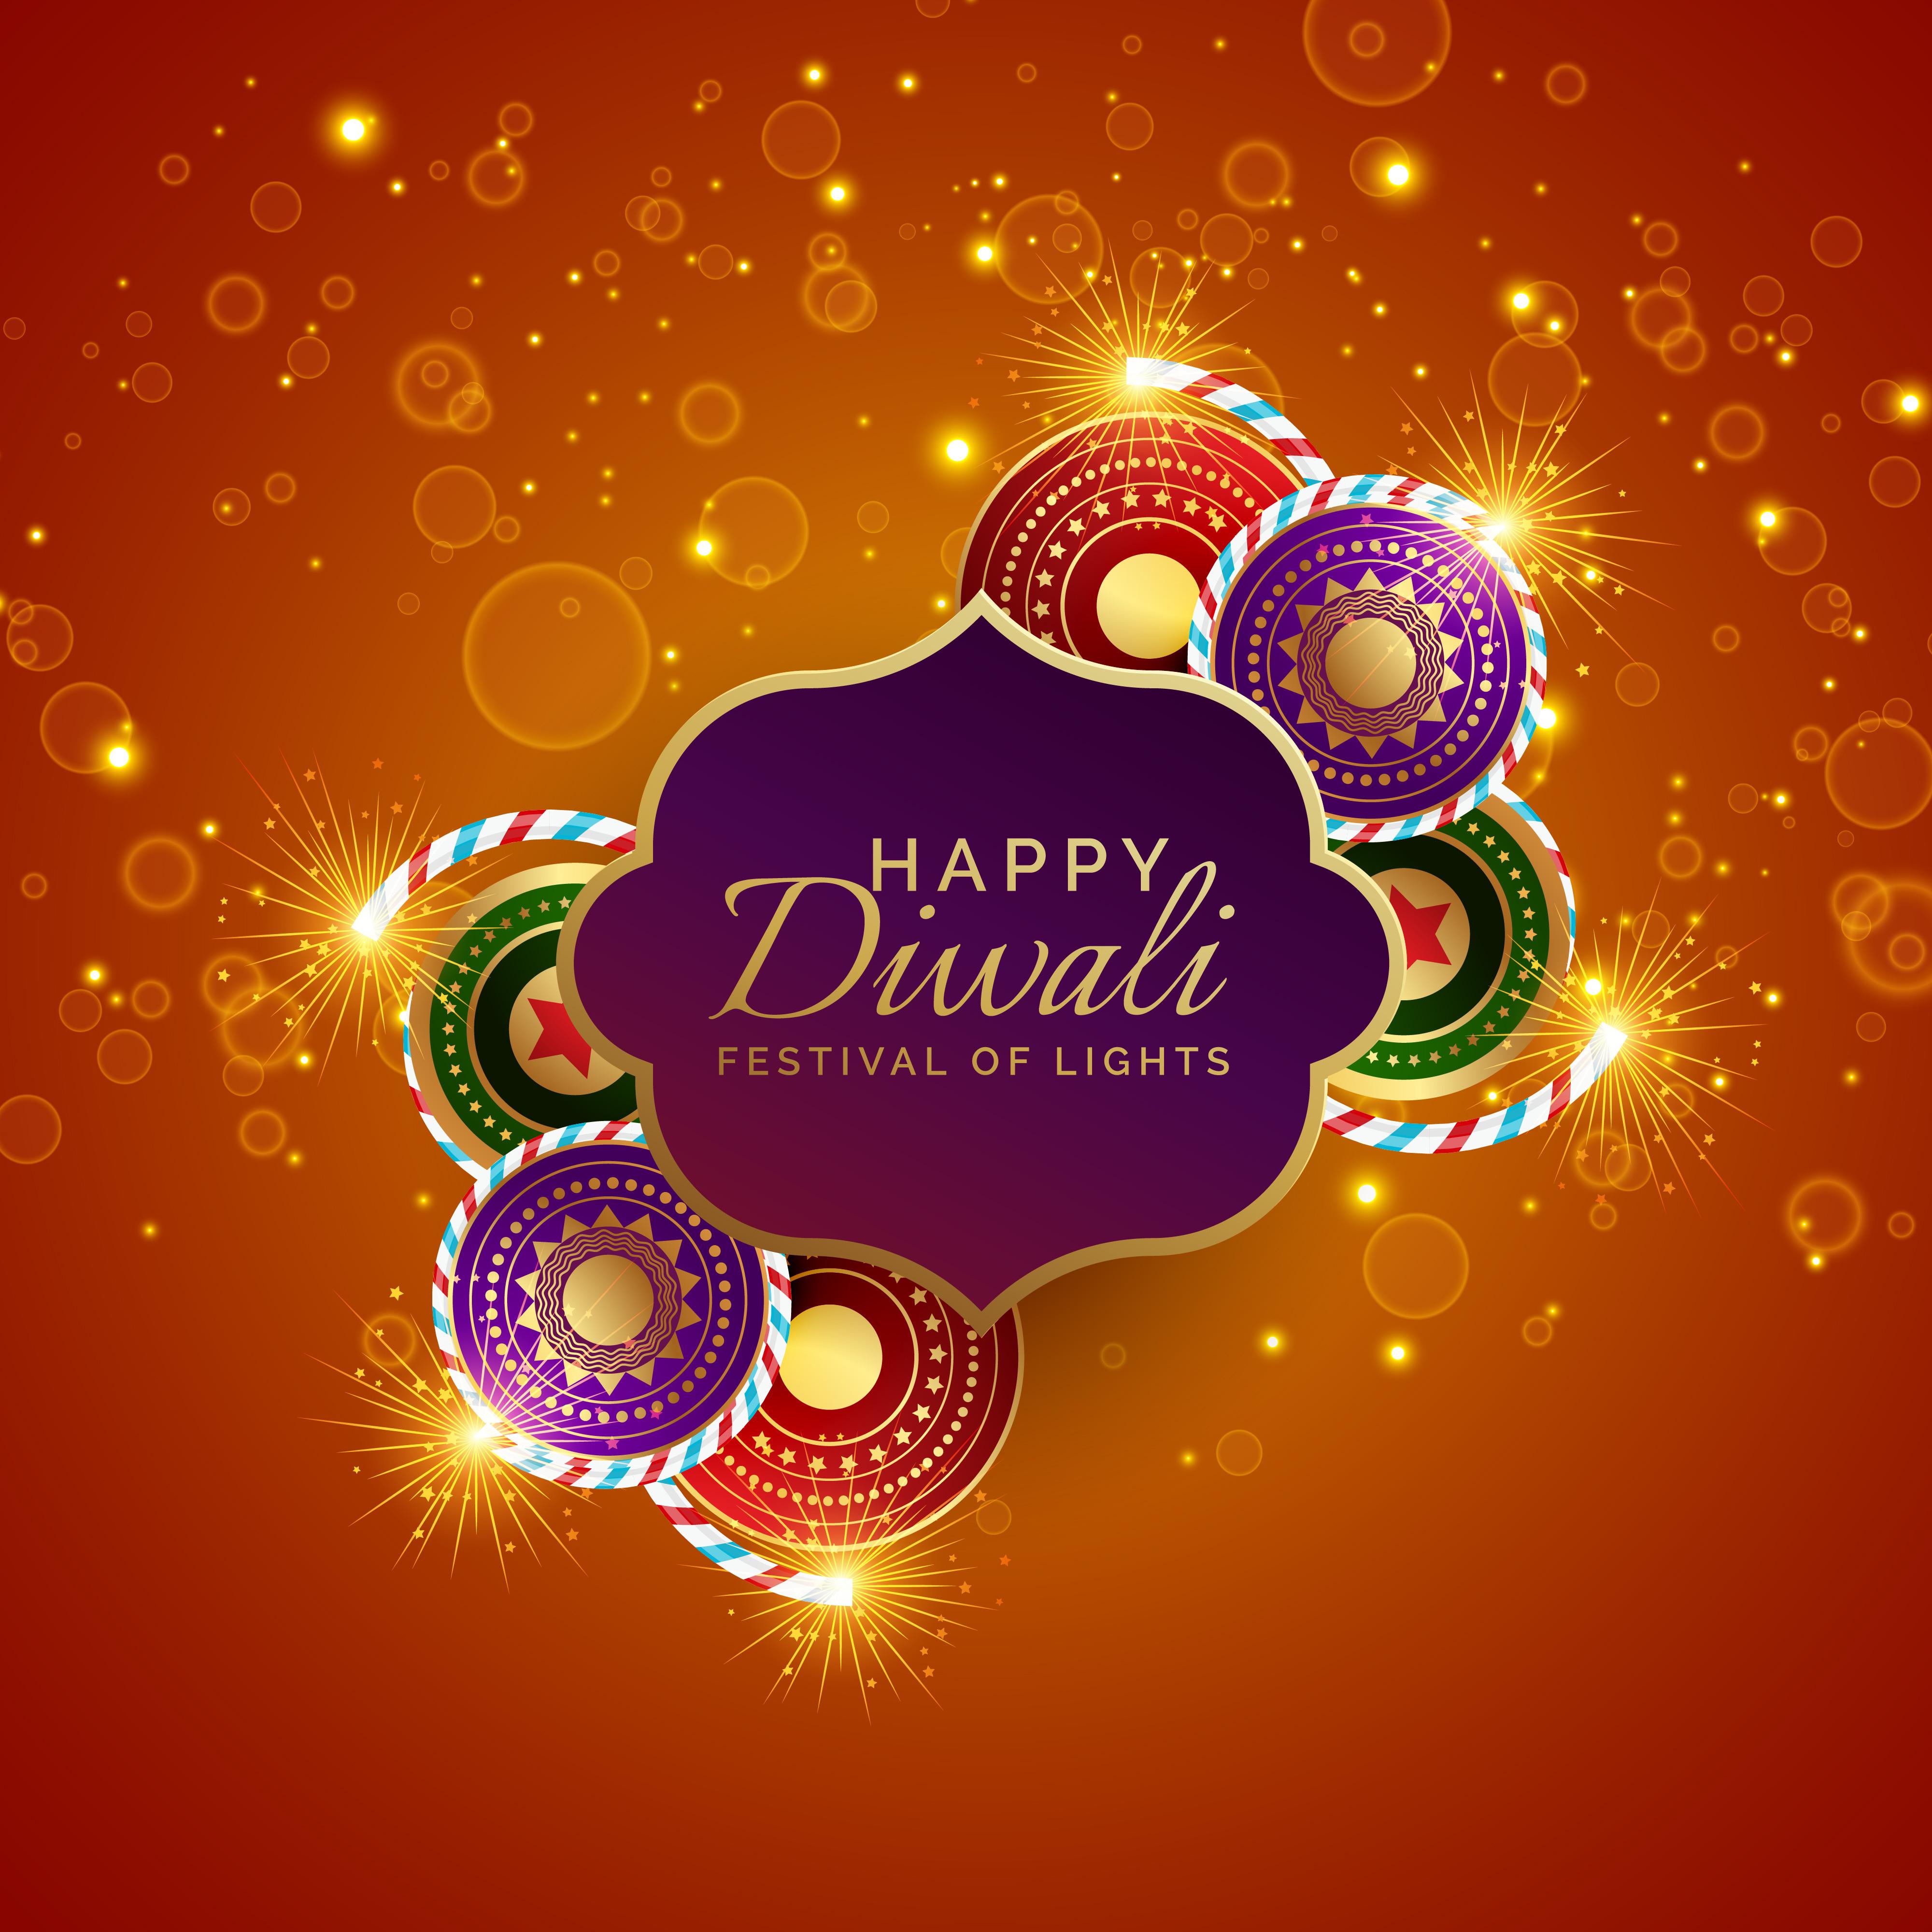 Diwali Stock Photos And Images - RF